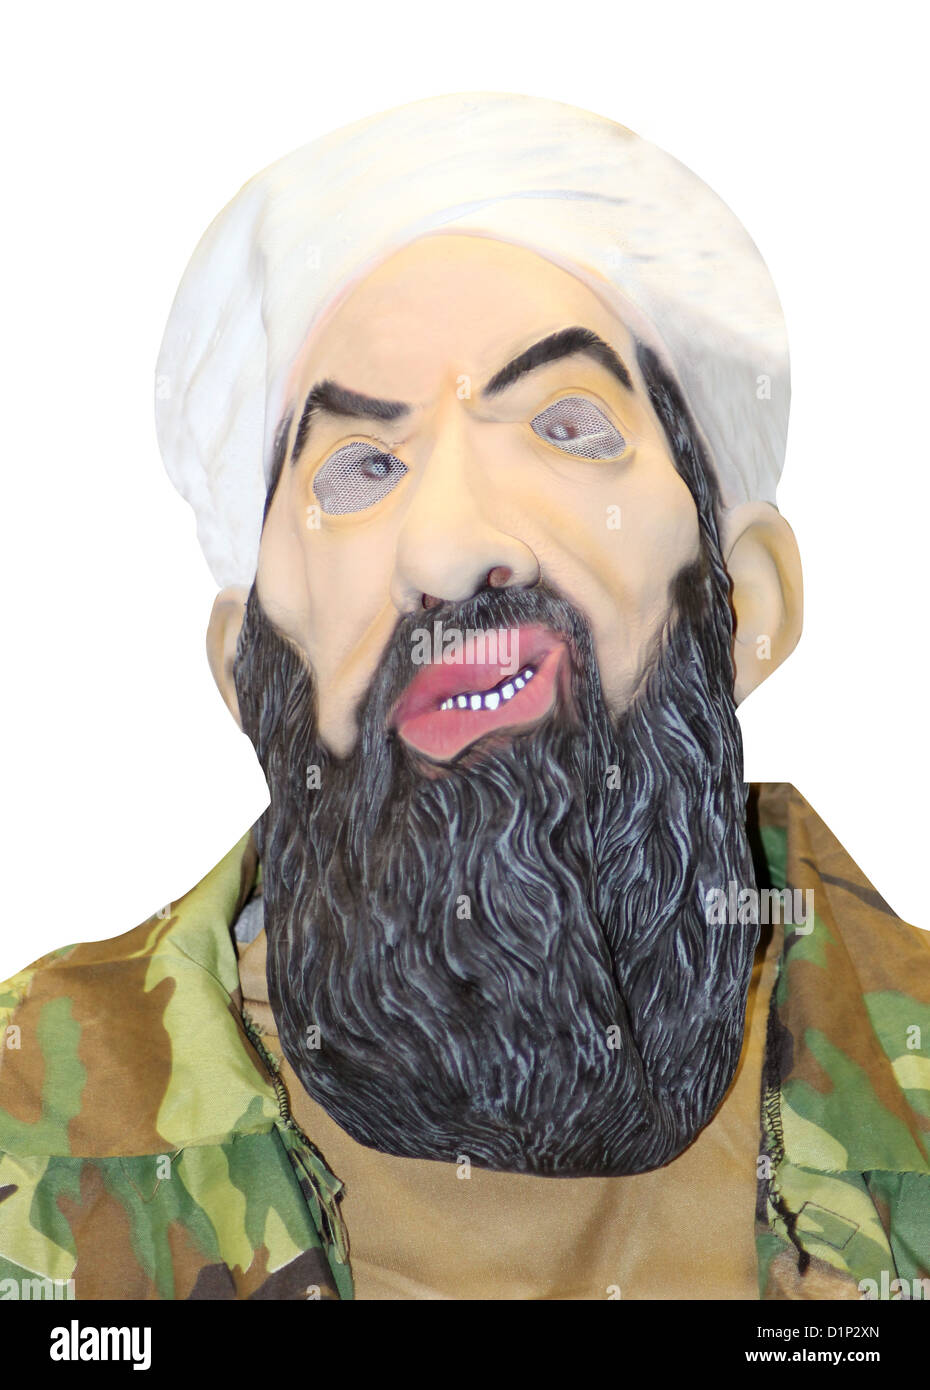 Portrait of person in mask of Osama Bin Laden, white studio background. - Stock Image